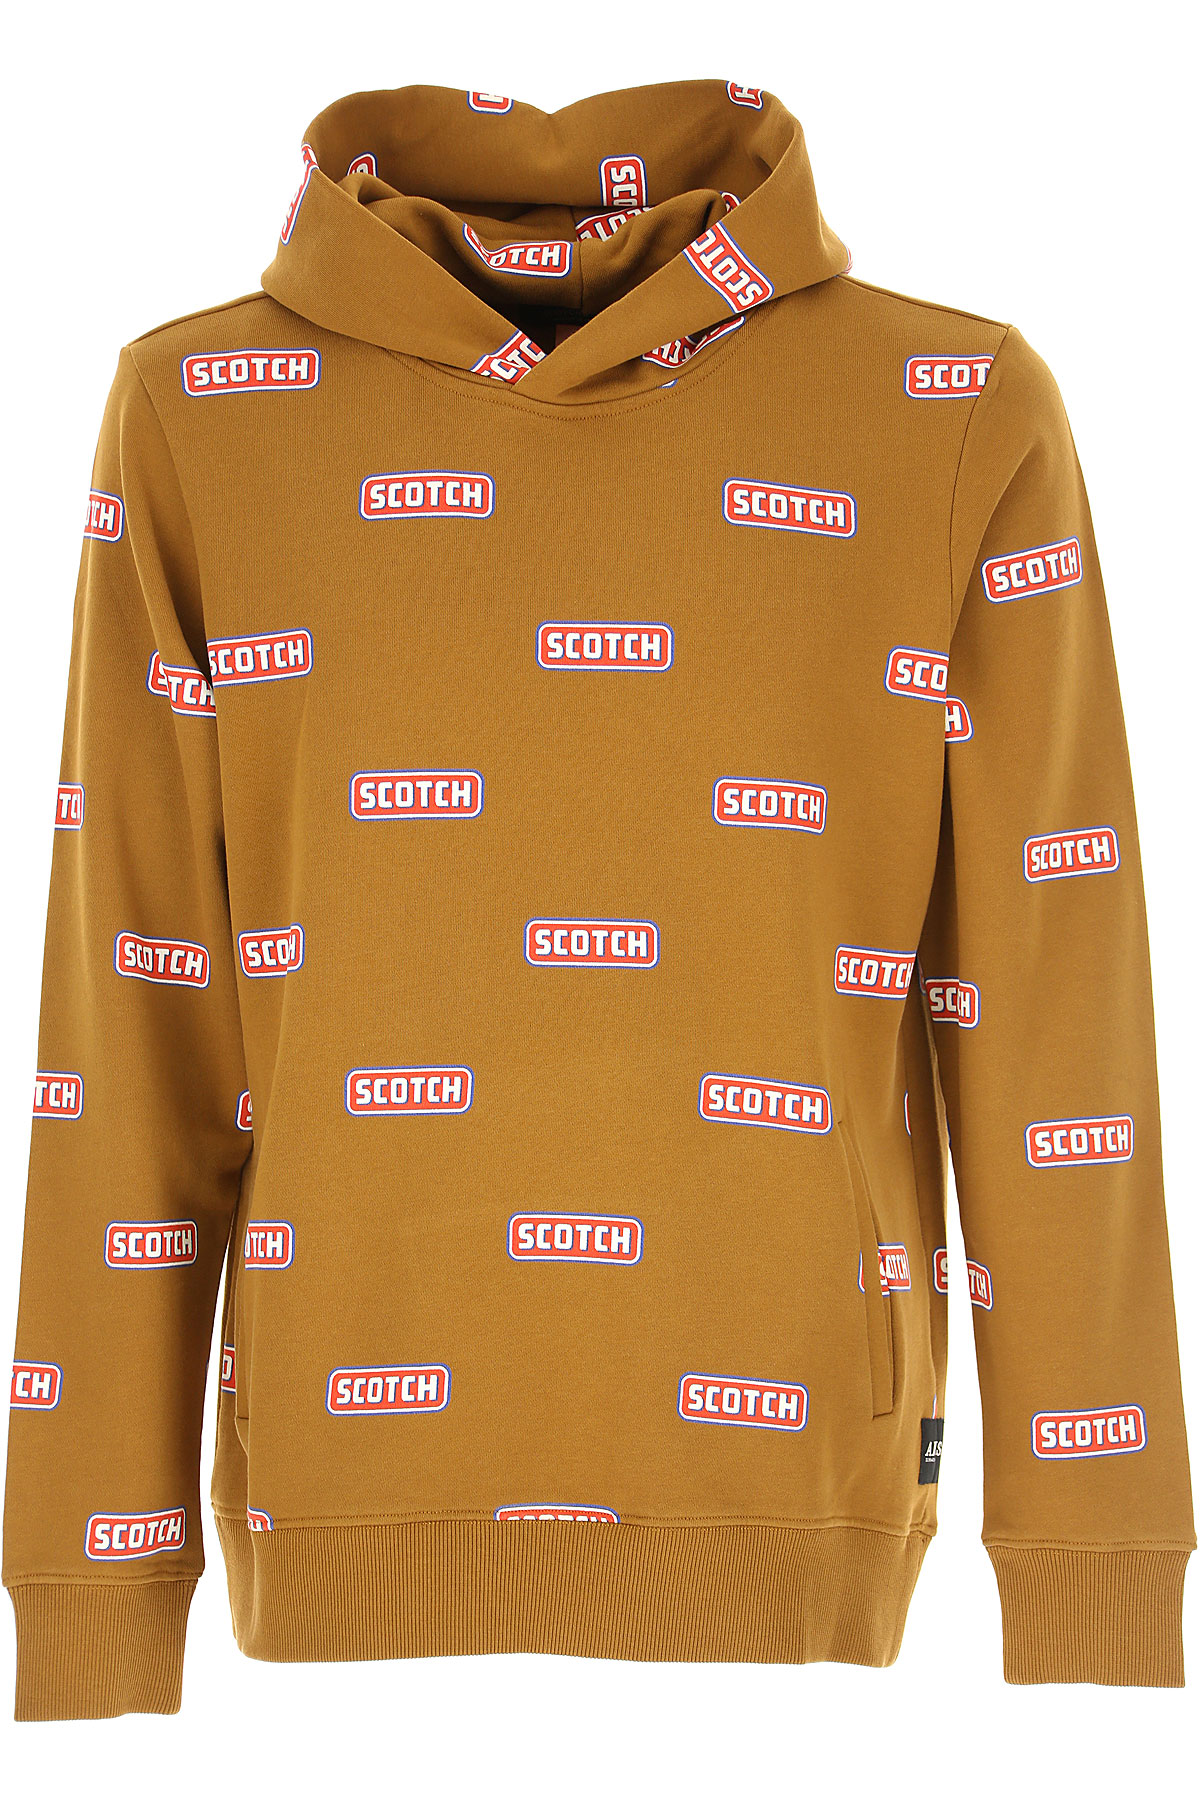 Scotch & Soda Sweatshirt for Men On Sale, Brown, Cotton, 2019, L M S XL